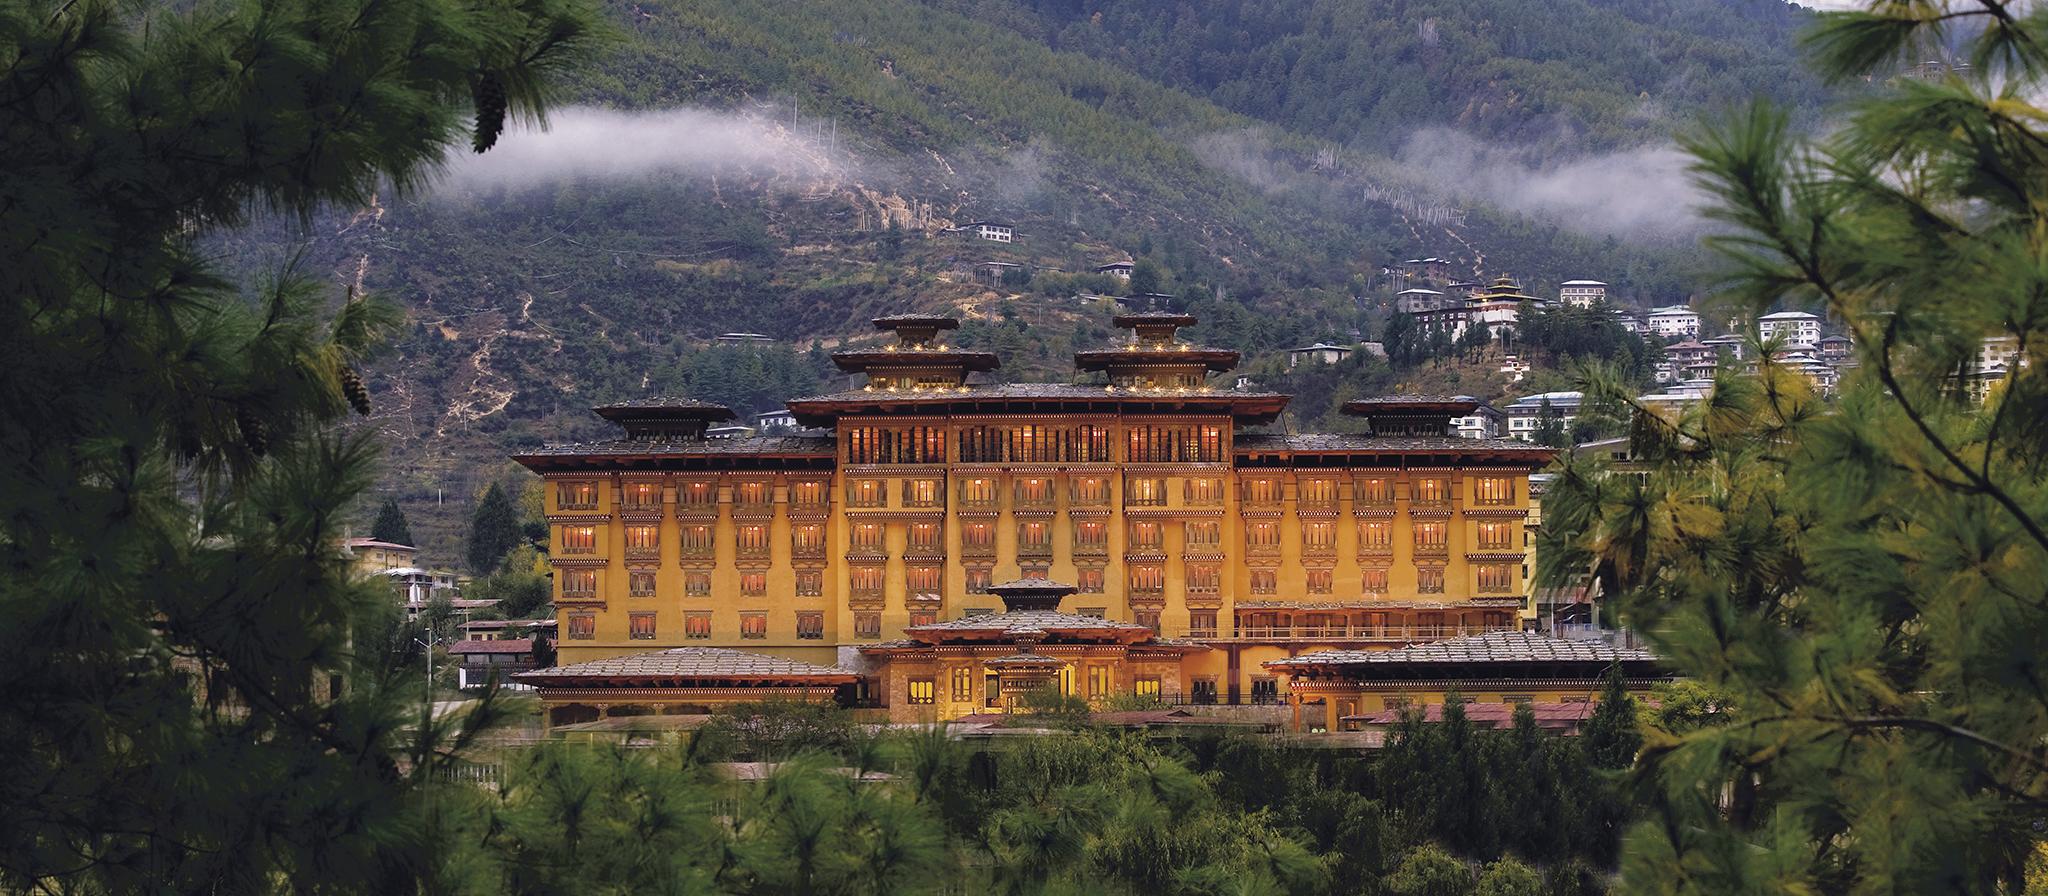 taj tashi bhutan trip, Bhutan, Druk Air, gho, Himalayan Kingdom, Kingdom of Bhutan, kira, Last Shangri-la, Taj Tashi, takin